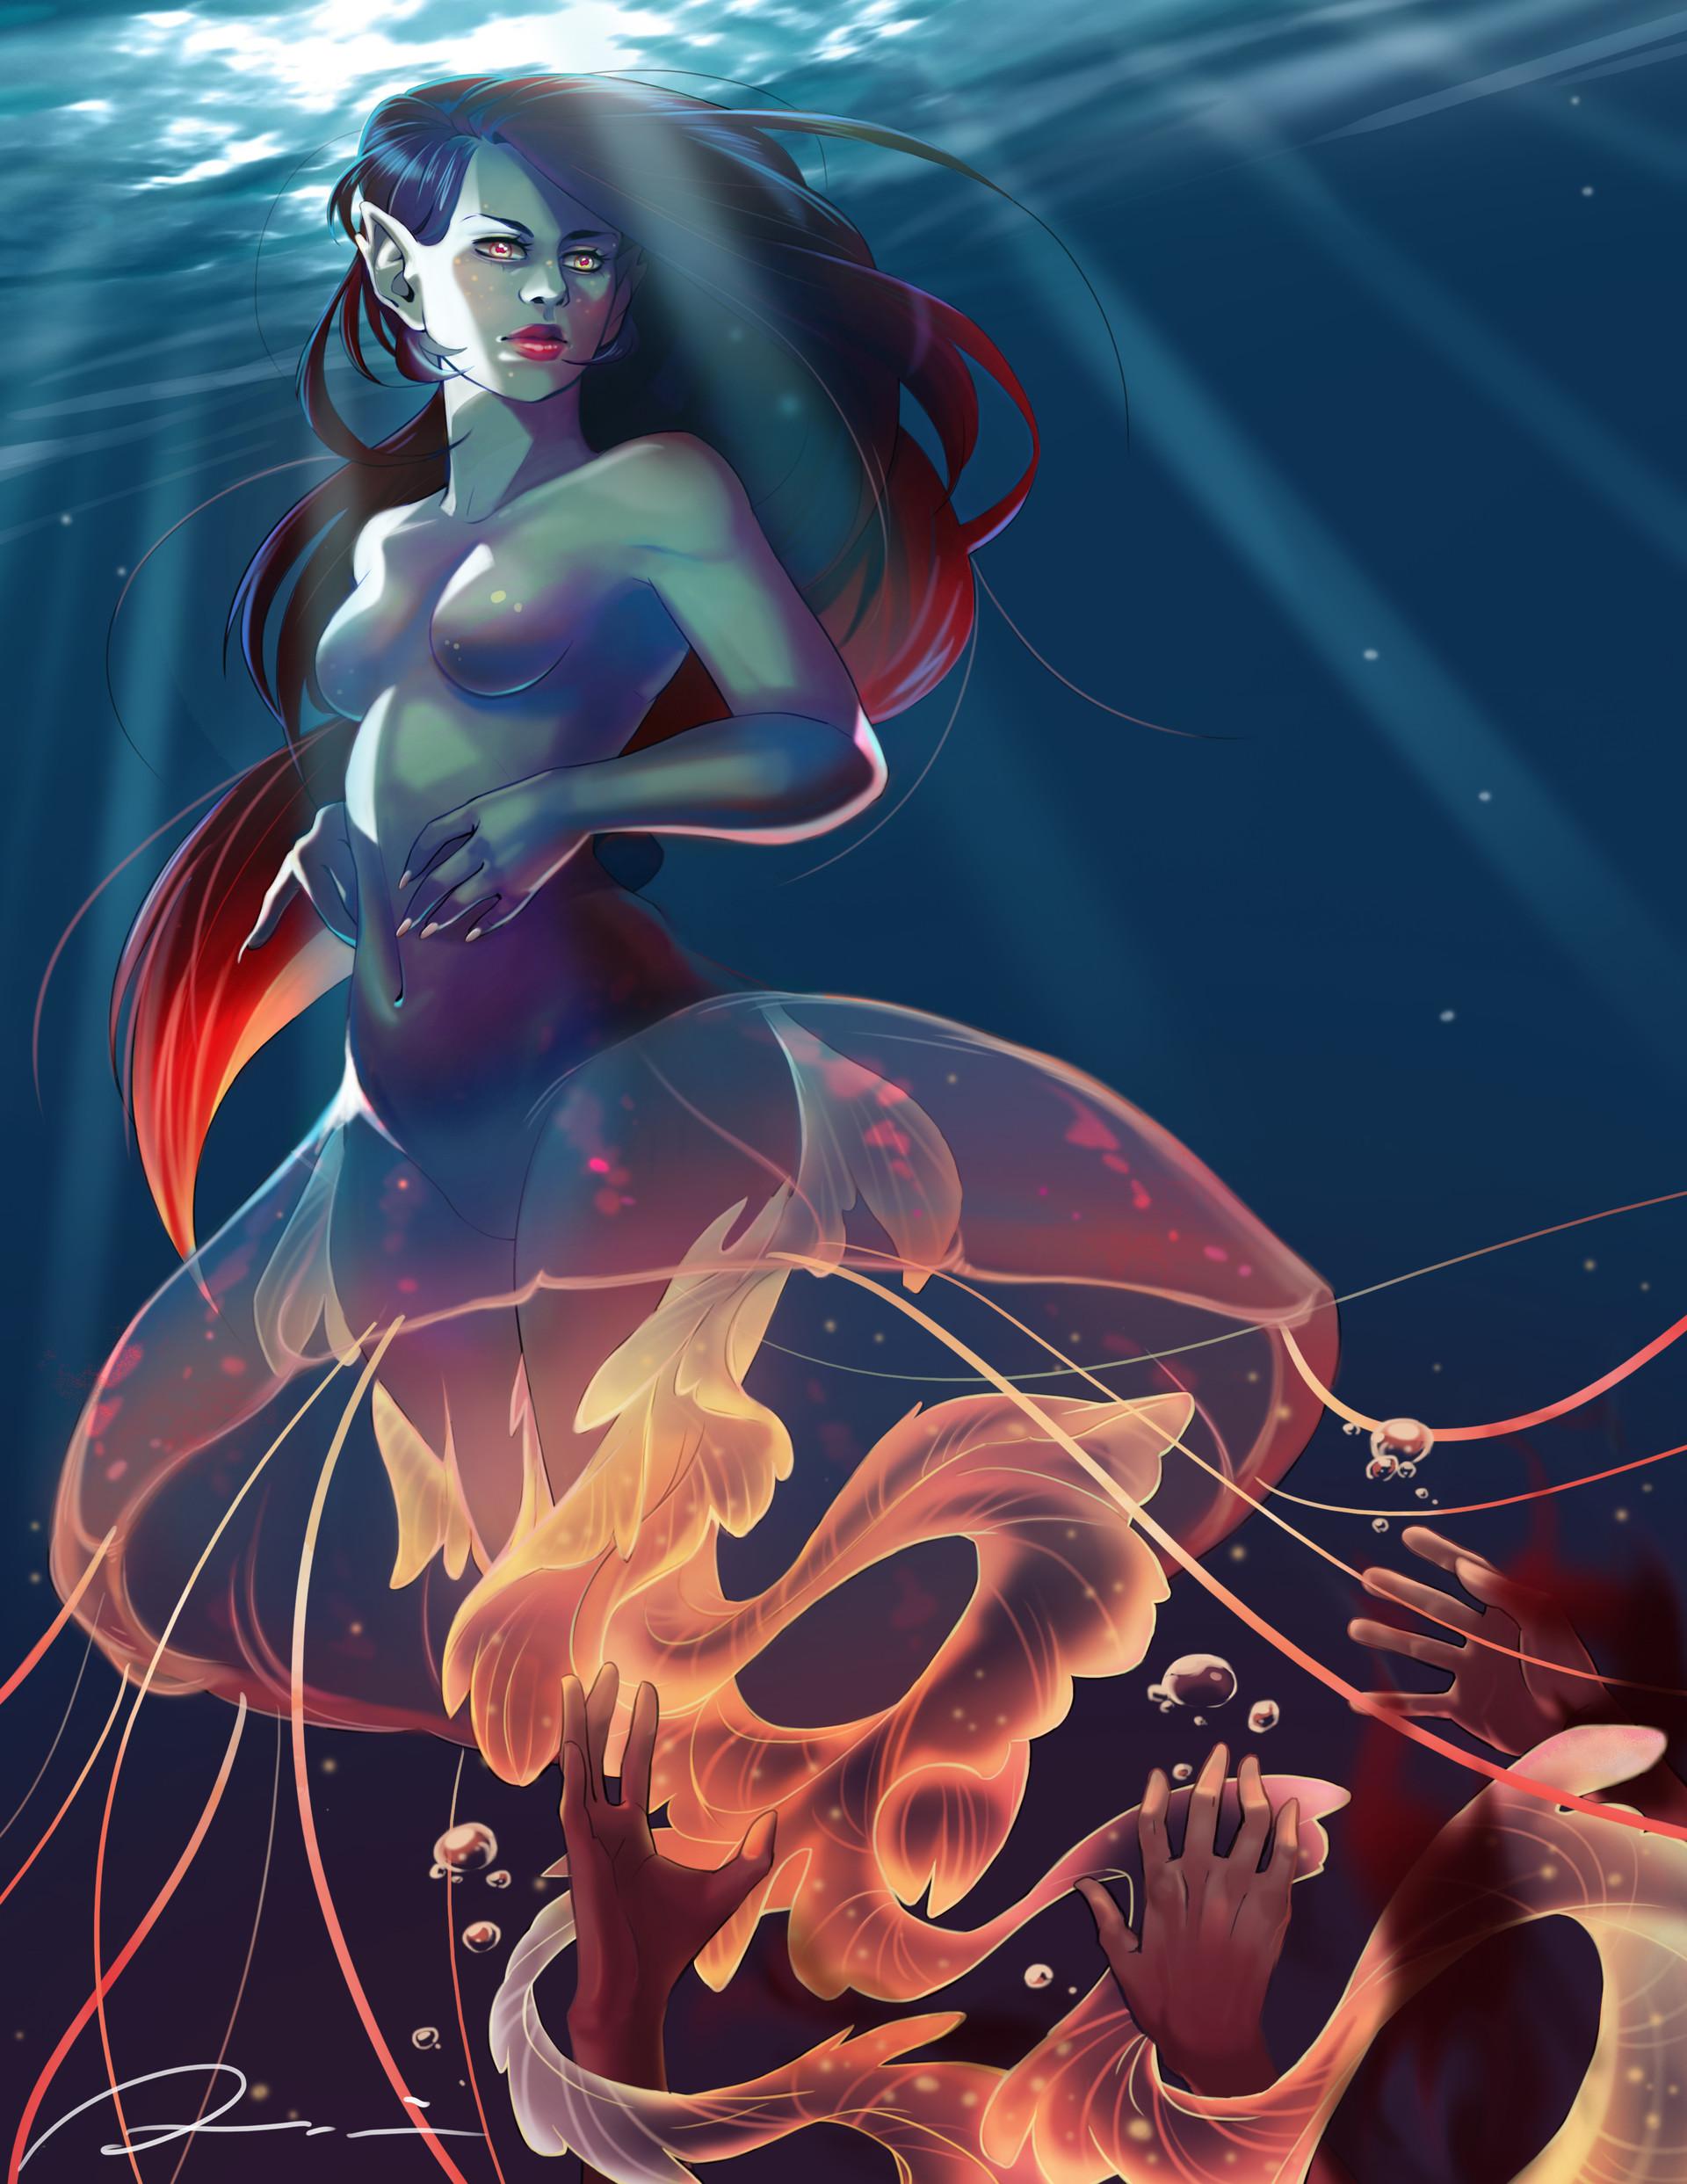 naomi-mcleod-jellyfish.jpg